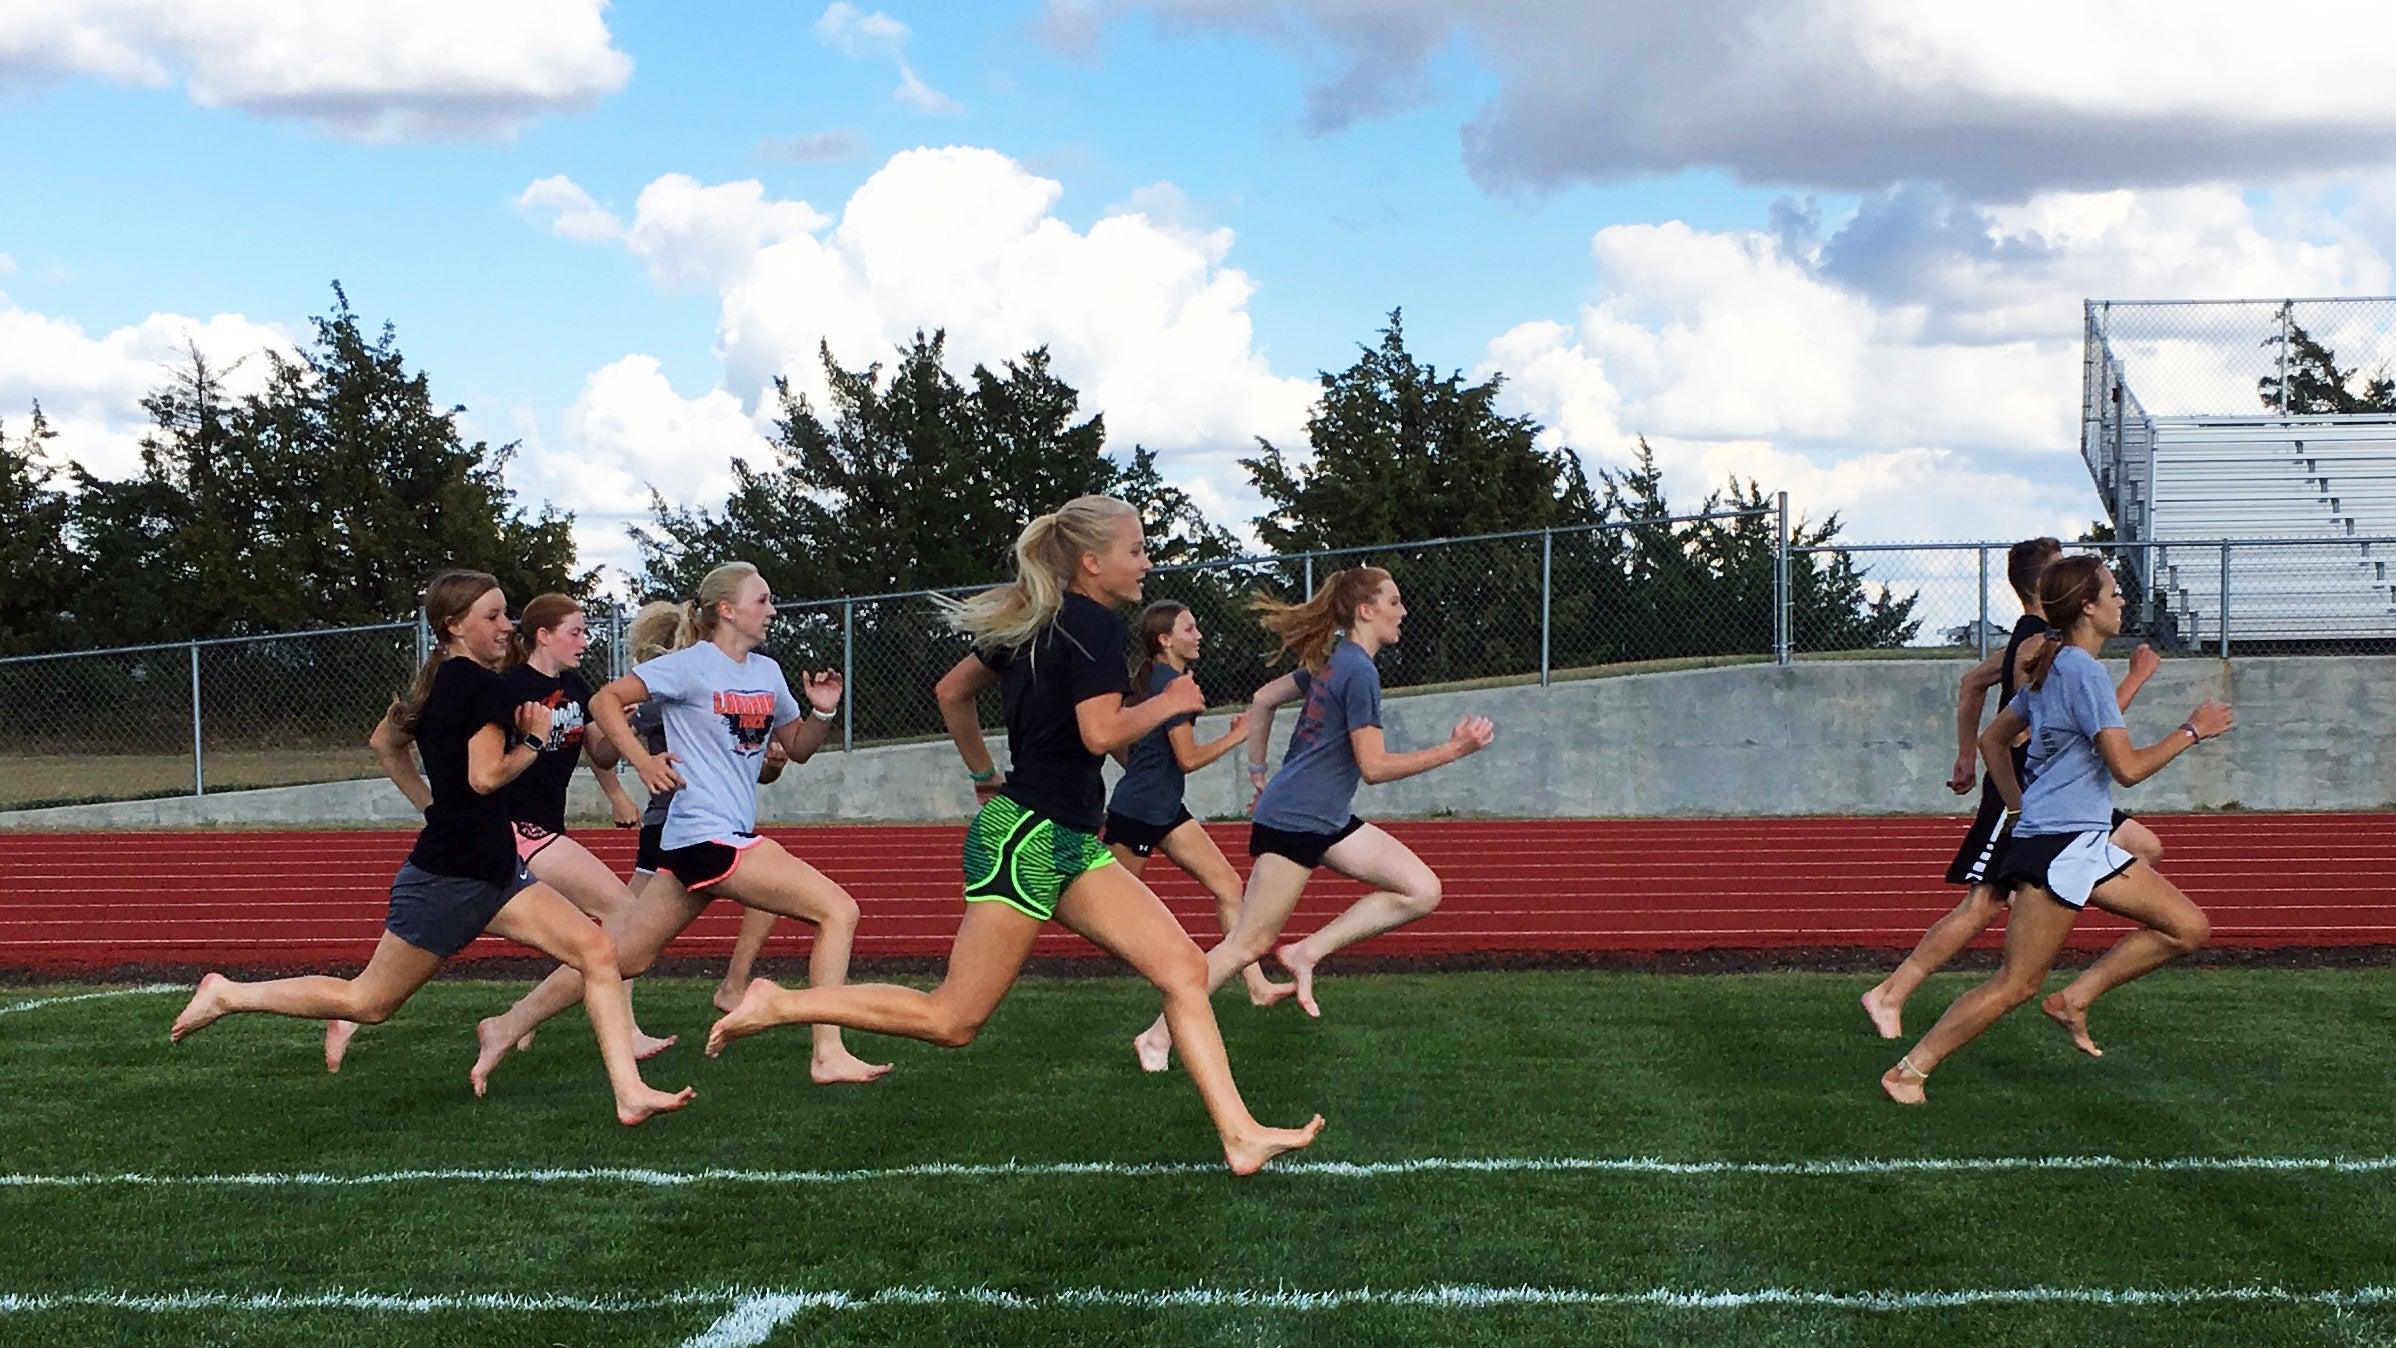 female runners doing barefoot strides on grass